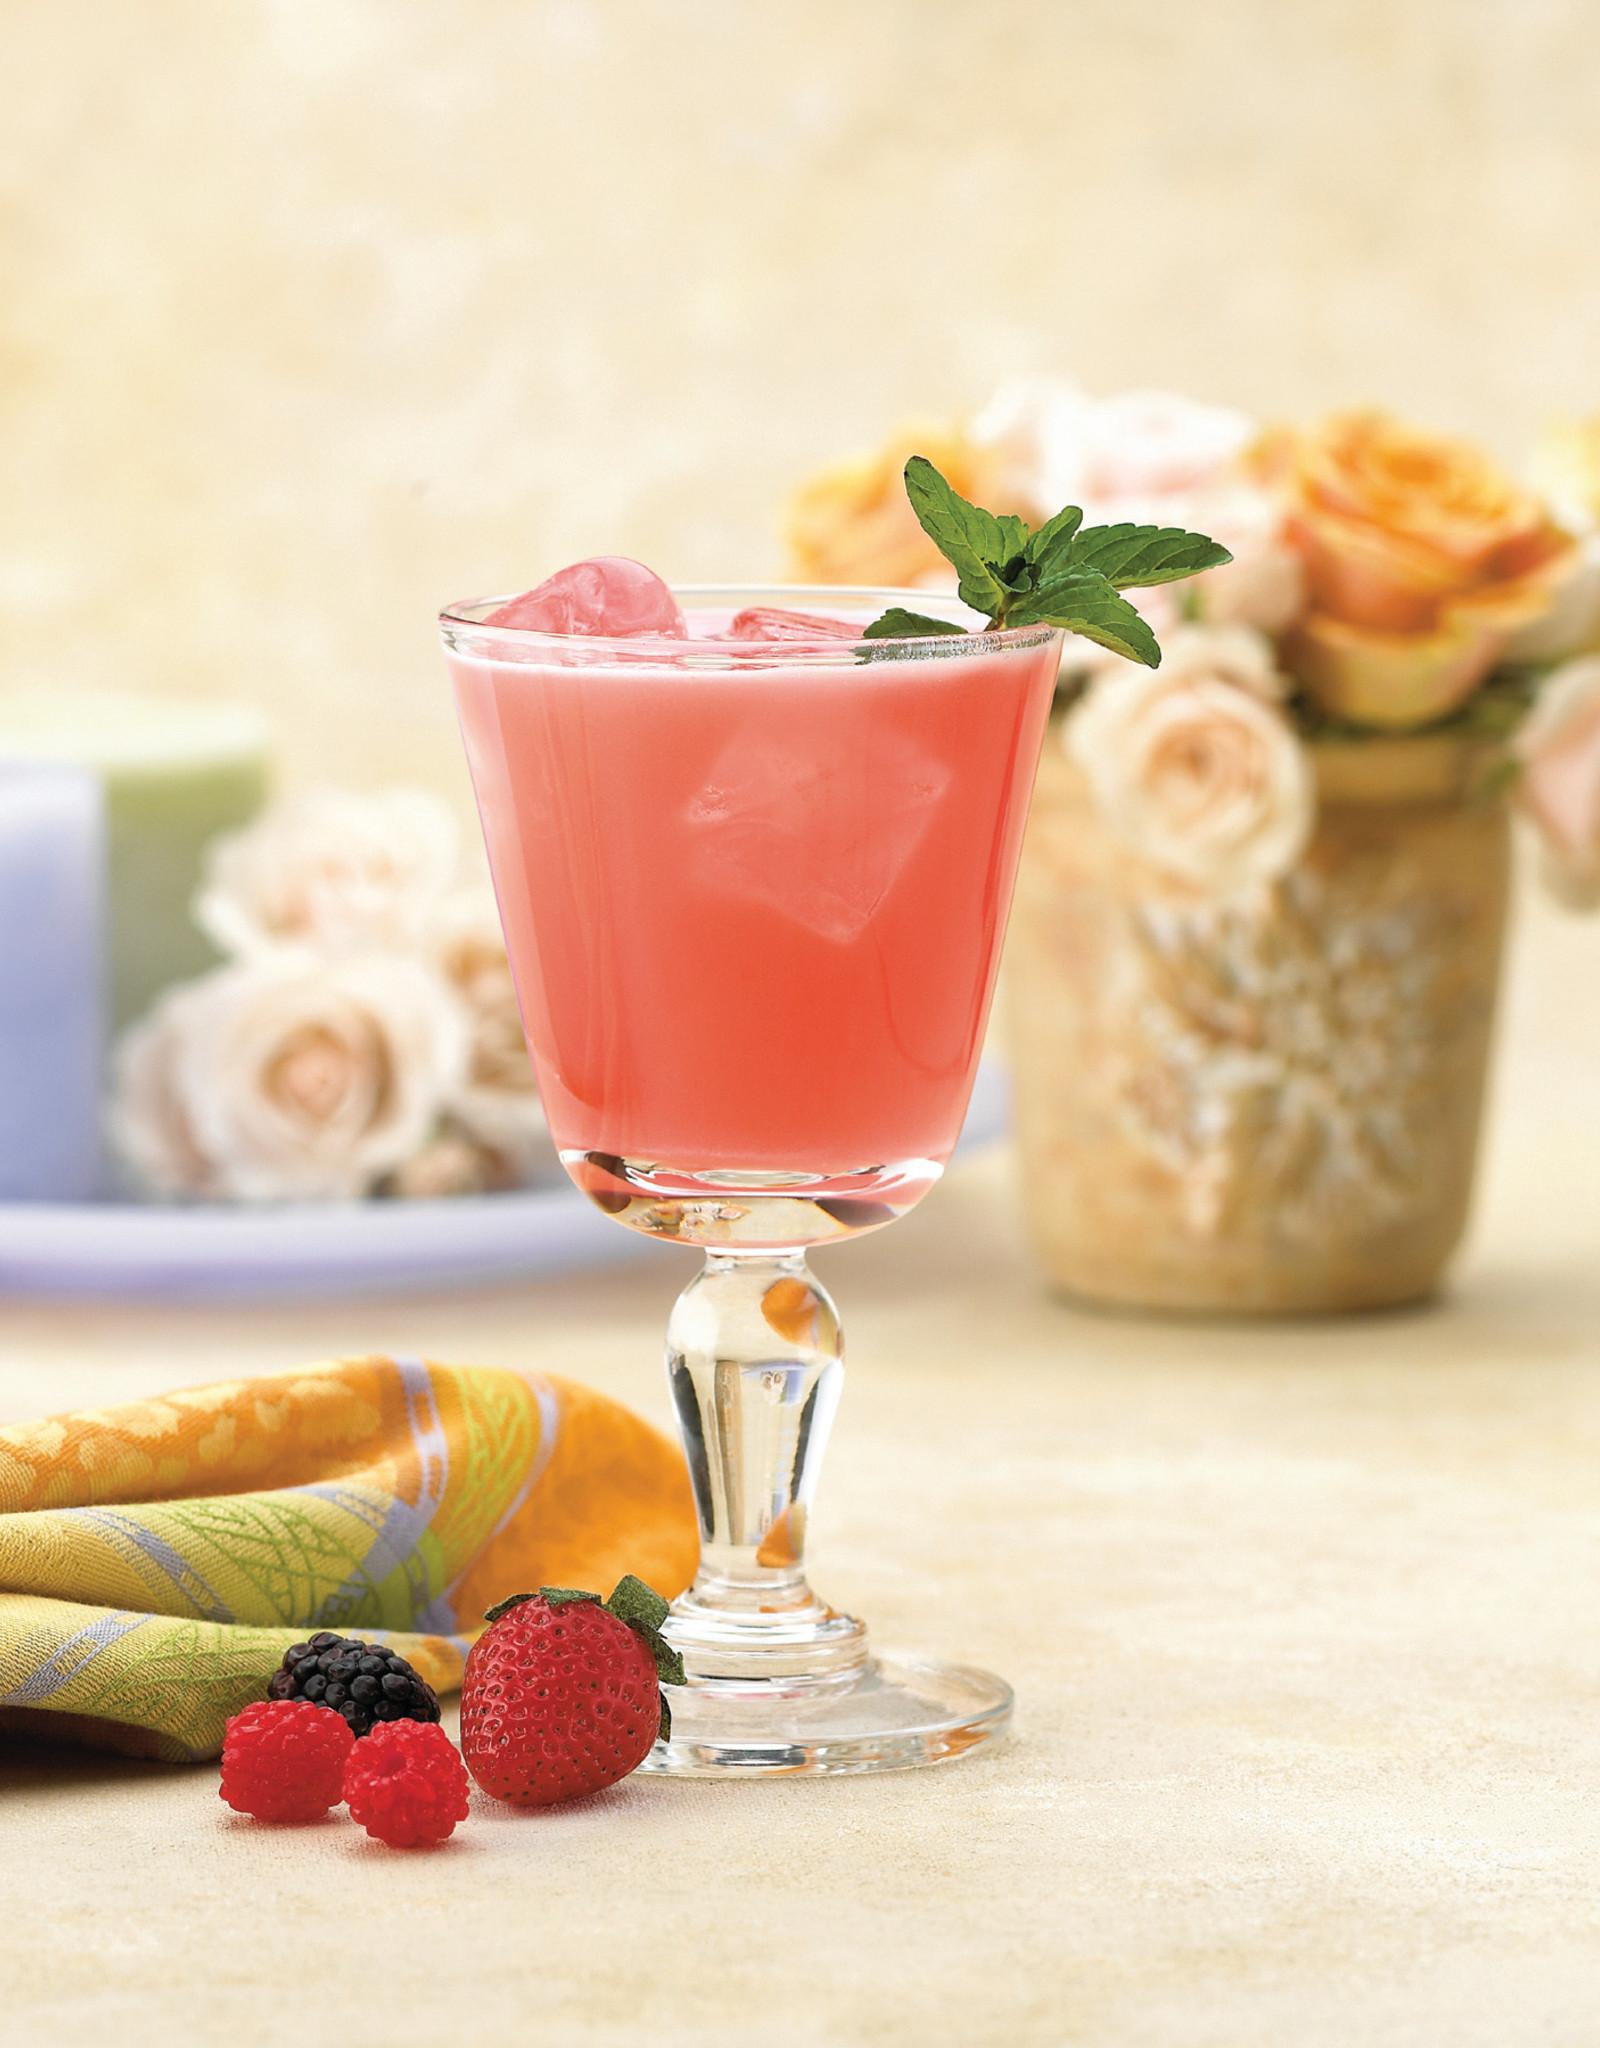 Advanced Laparoscopic Associates Wild berry Fruit Drink